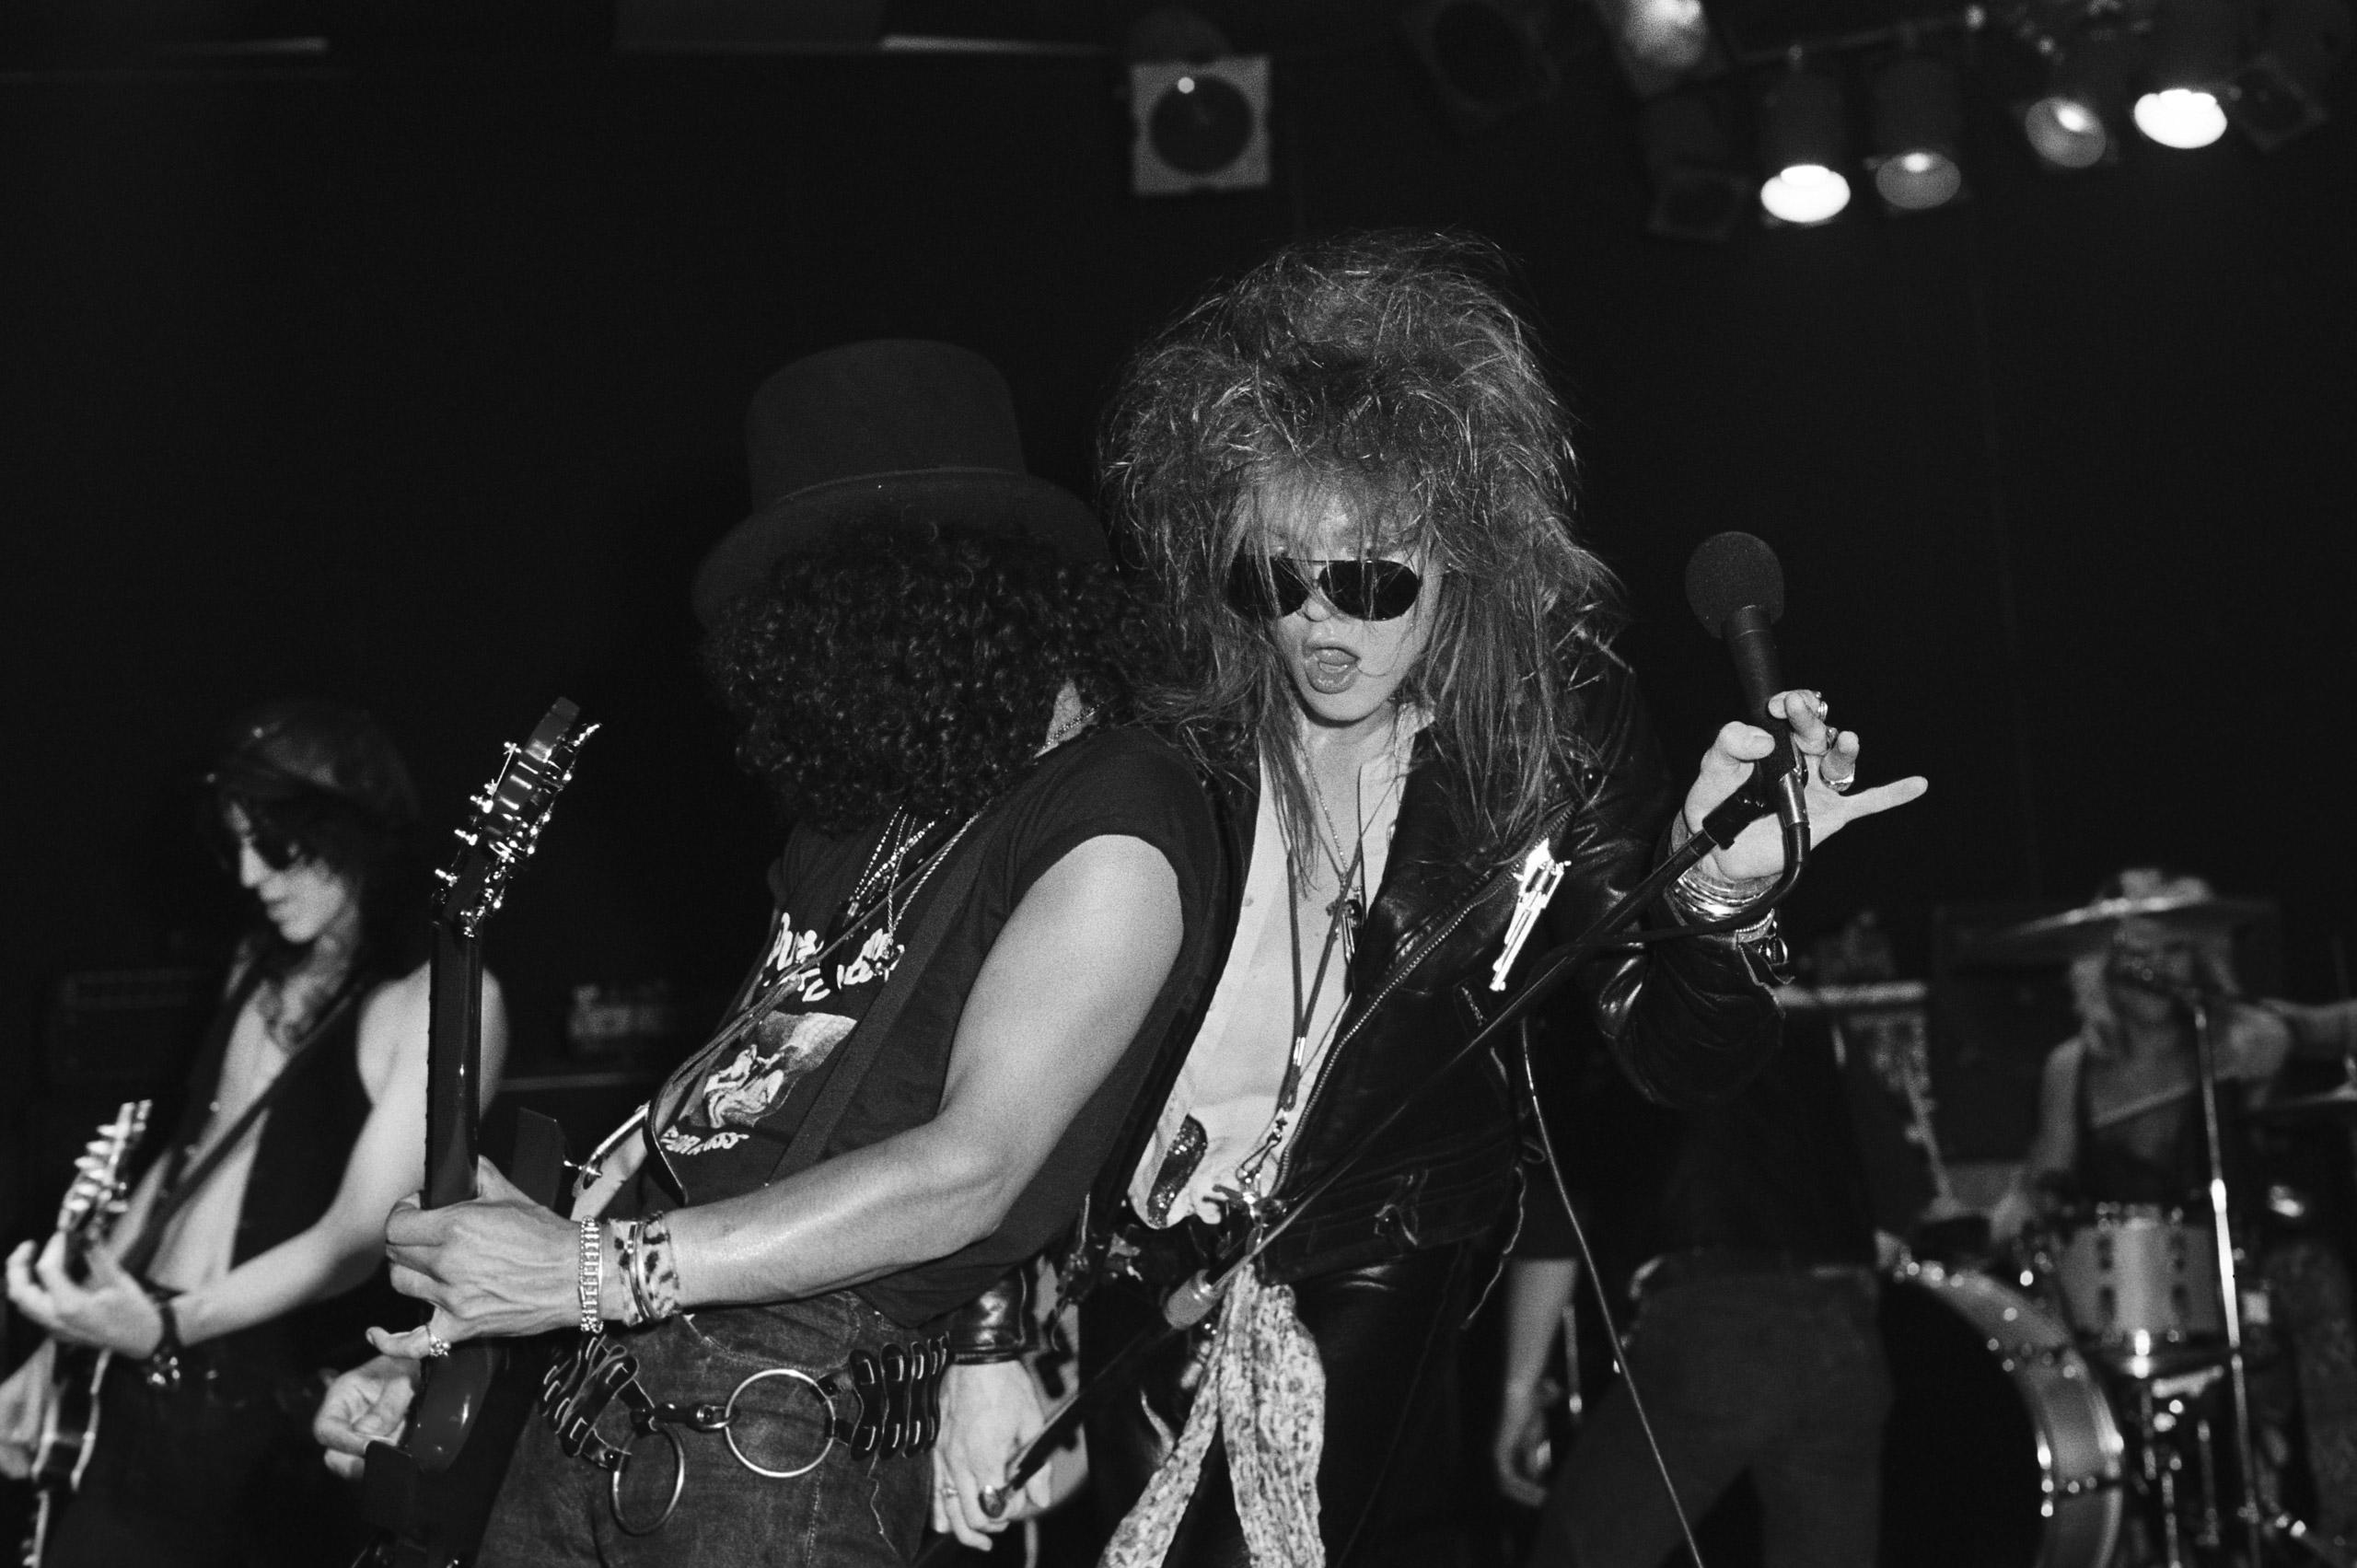 Izzy Stradlin, Slash, Axl Rose and Steven Adler of Guns n' Roses perform at The Whisky-a-Go-Go  on Aug. 23,1986 in Los Angeles